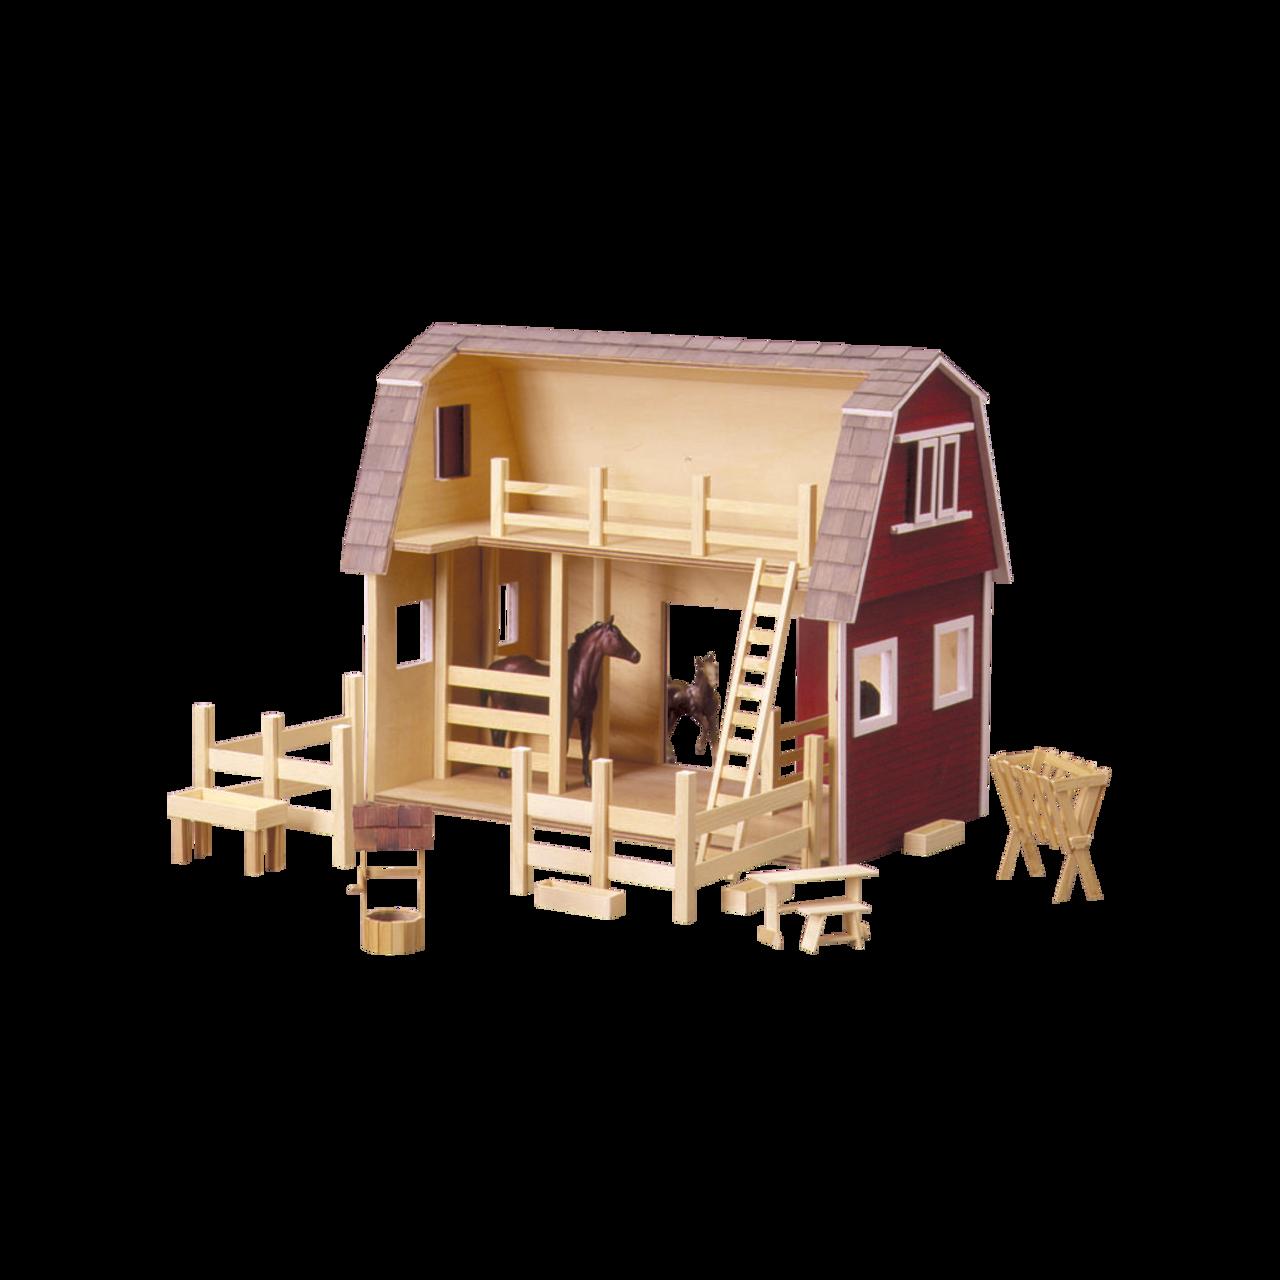 Ruff 'n Rustic All American Barn Dollhouse Kit